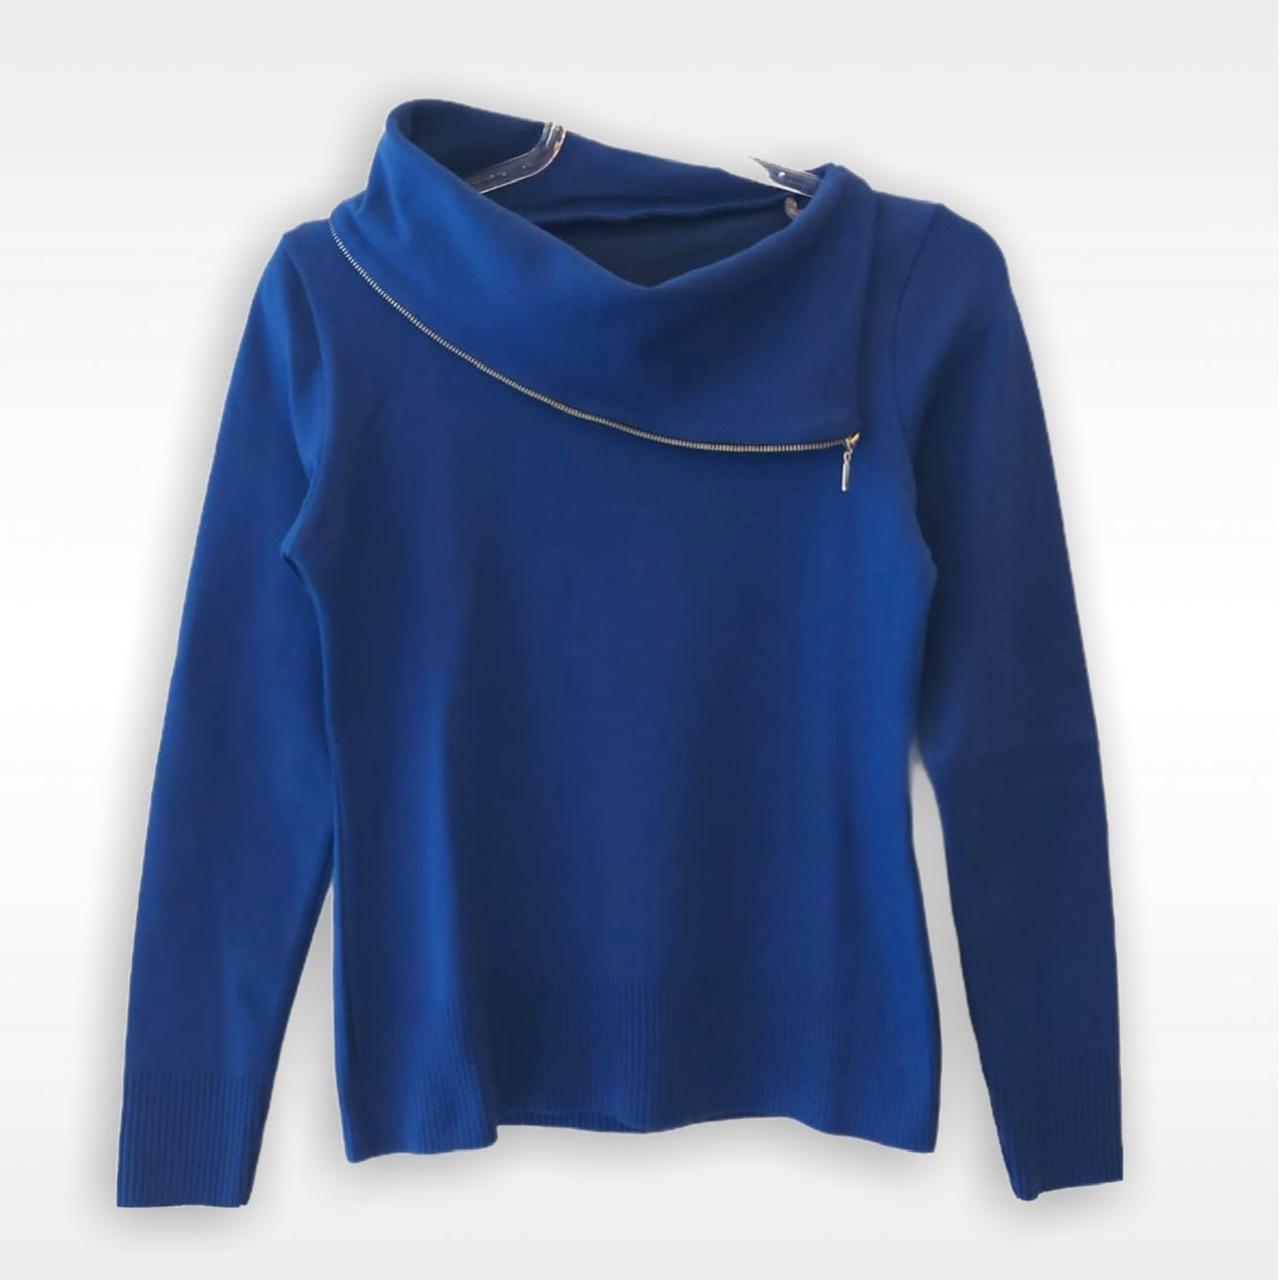 Blusa Fernanda royal tricot  - Vivian Bógus